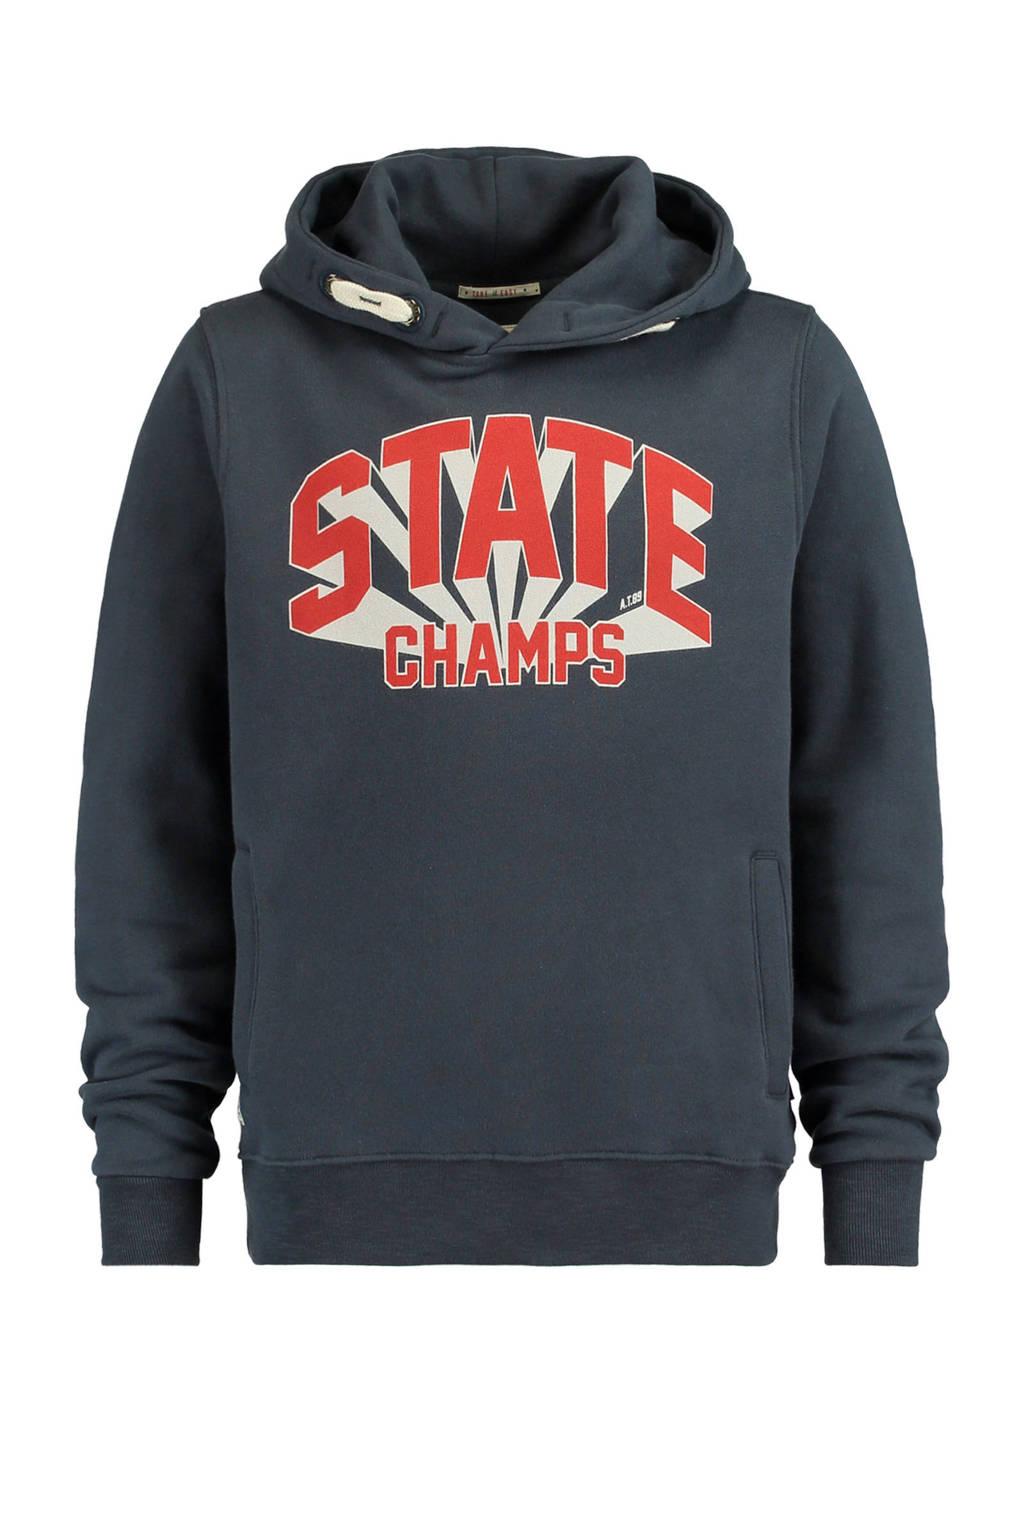 America Today Junior hoodie met tekst Shawn blauw, Donkerblauw